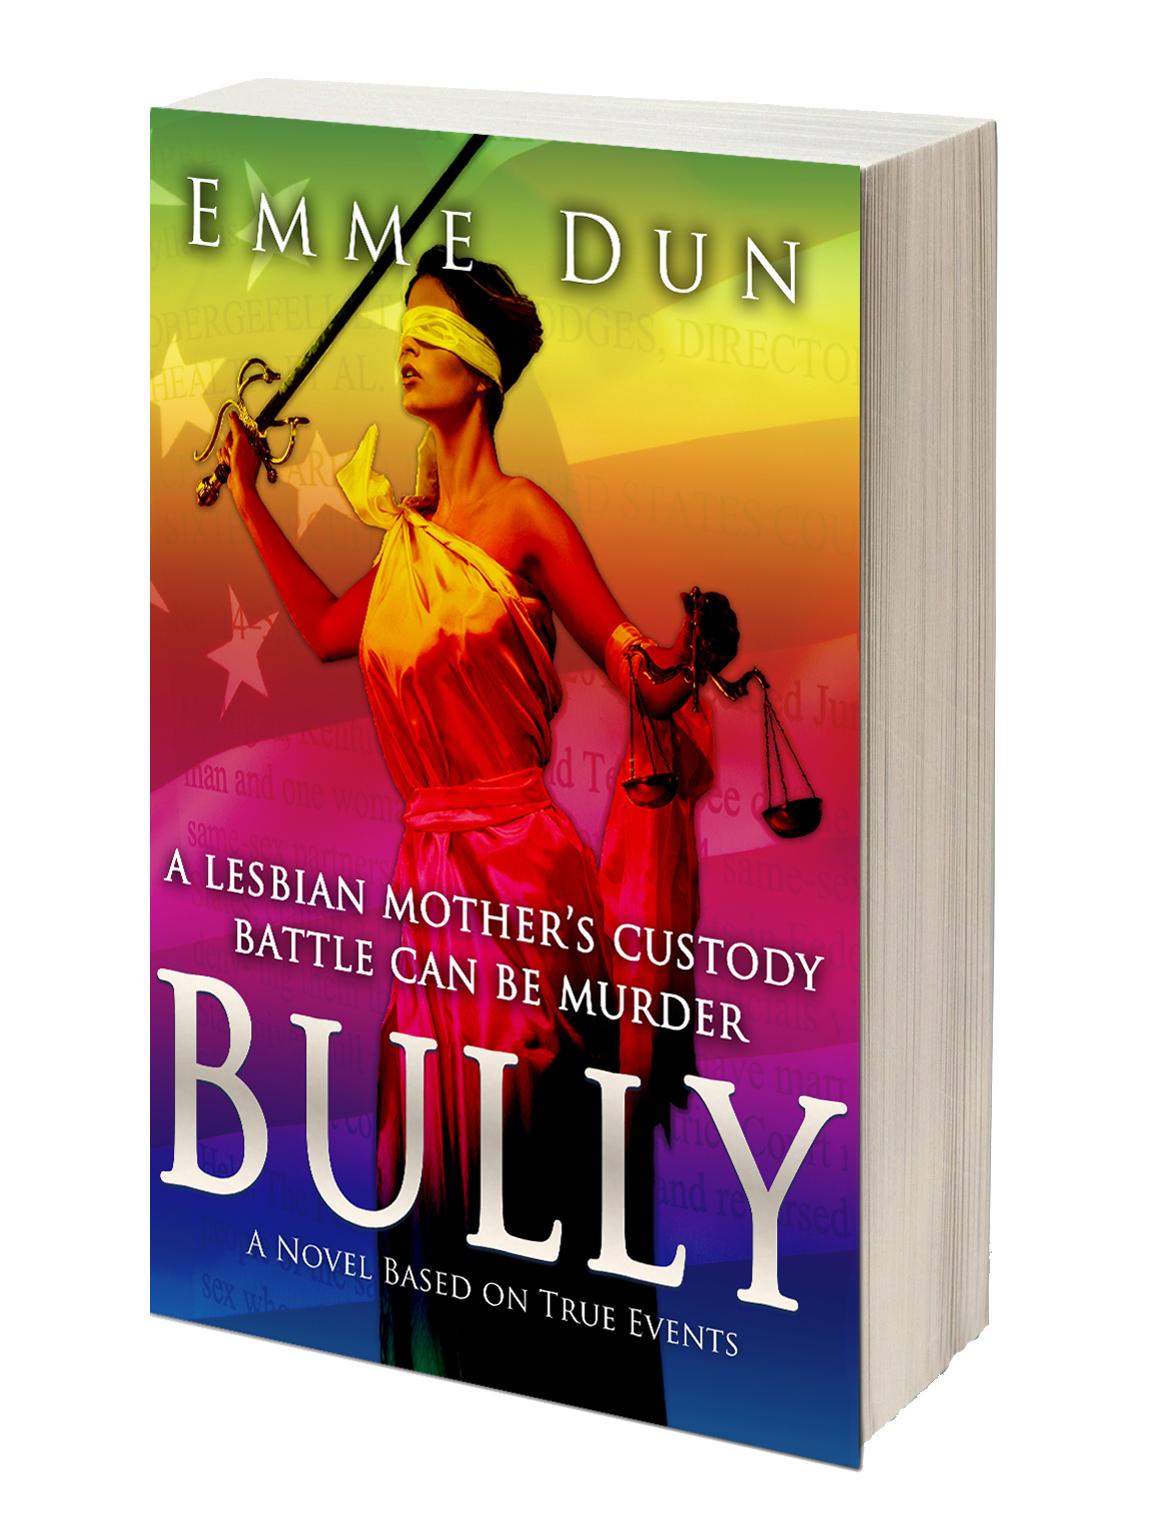 Bully - Emme Dun